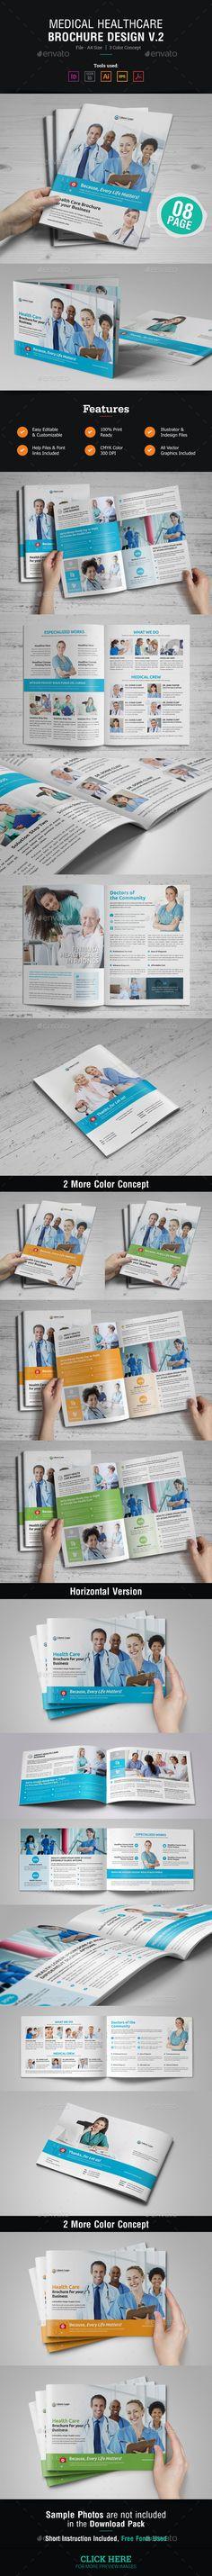 Company Profile Company profile, Template and Brochure template - healthcare brochure